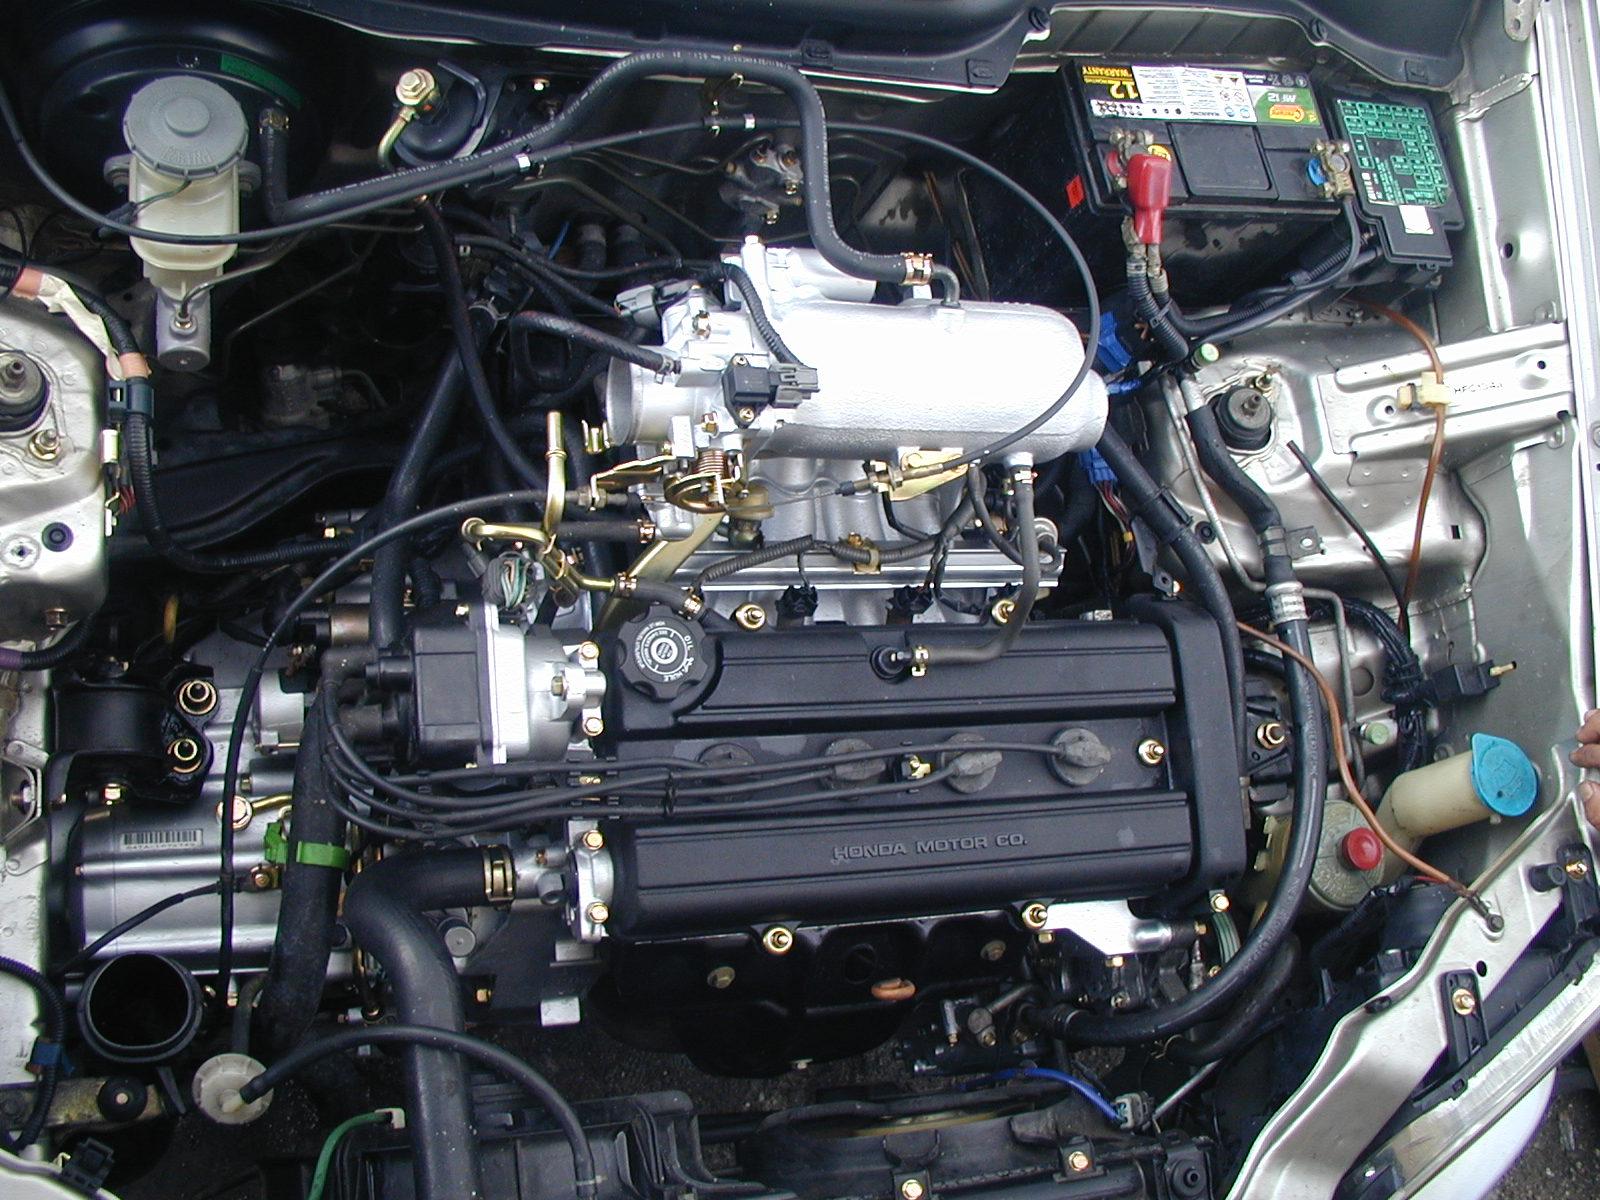 Koleksi Gambar Engine Yang Motecmat Lepas Overhaul